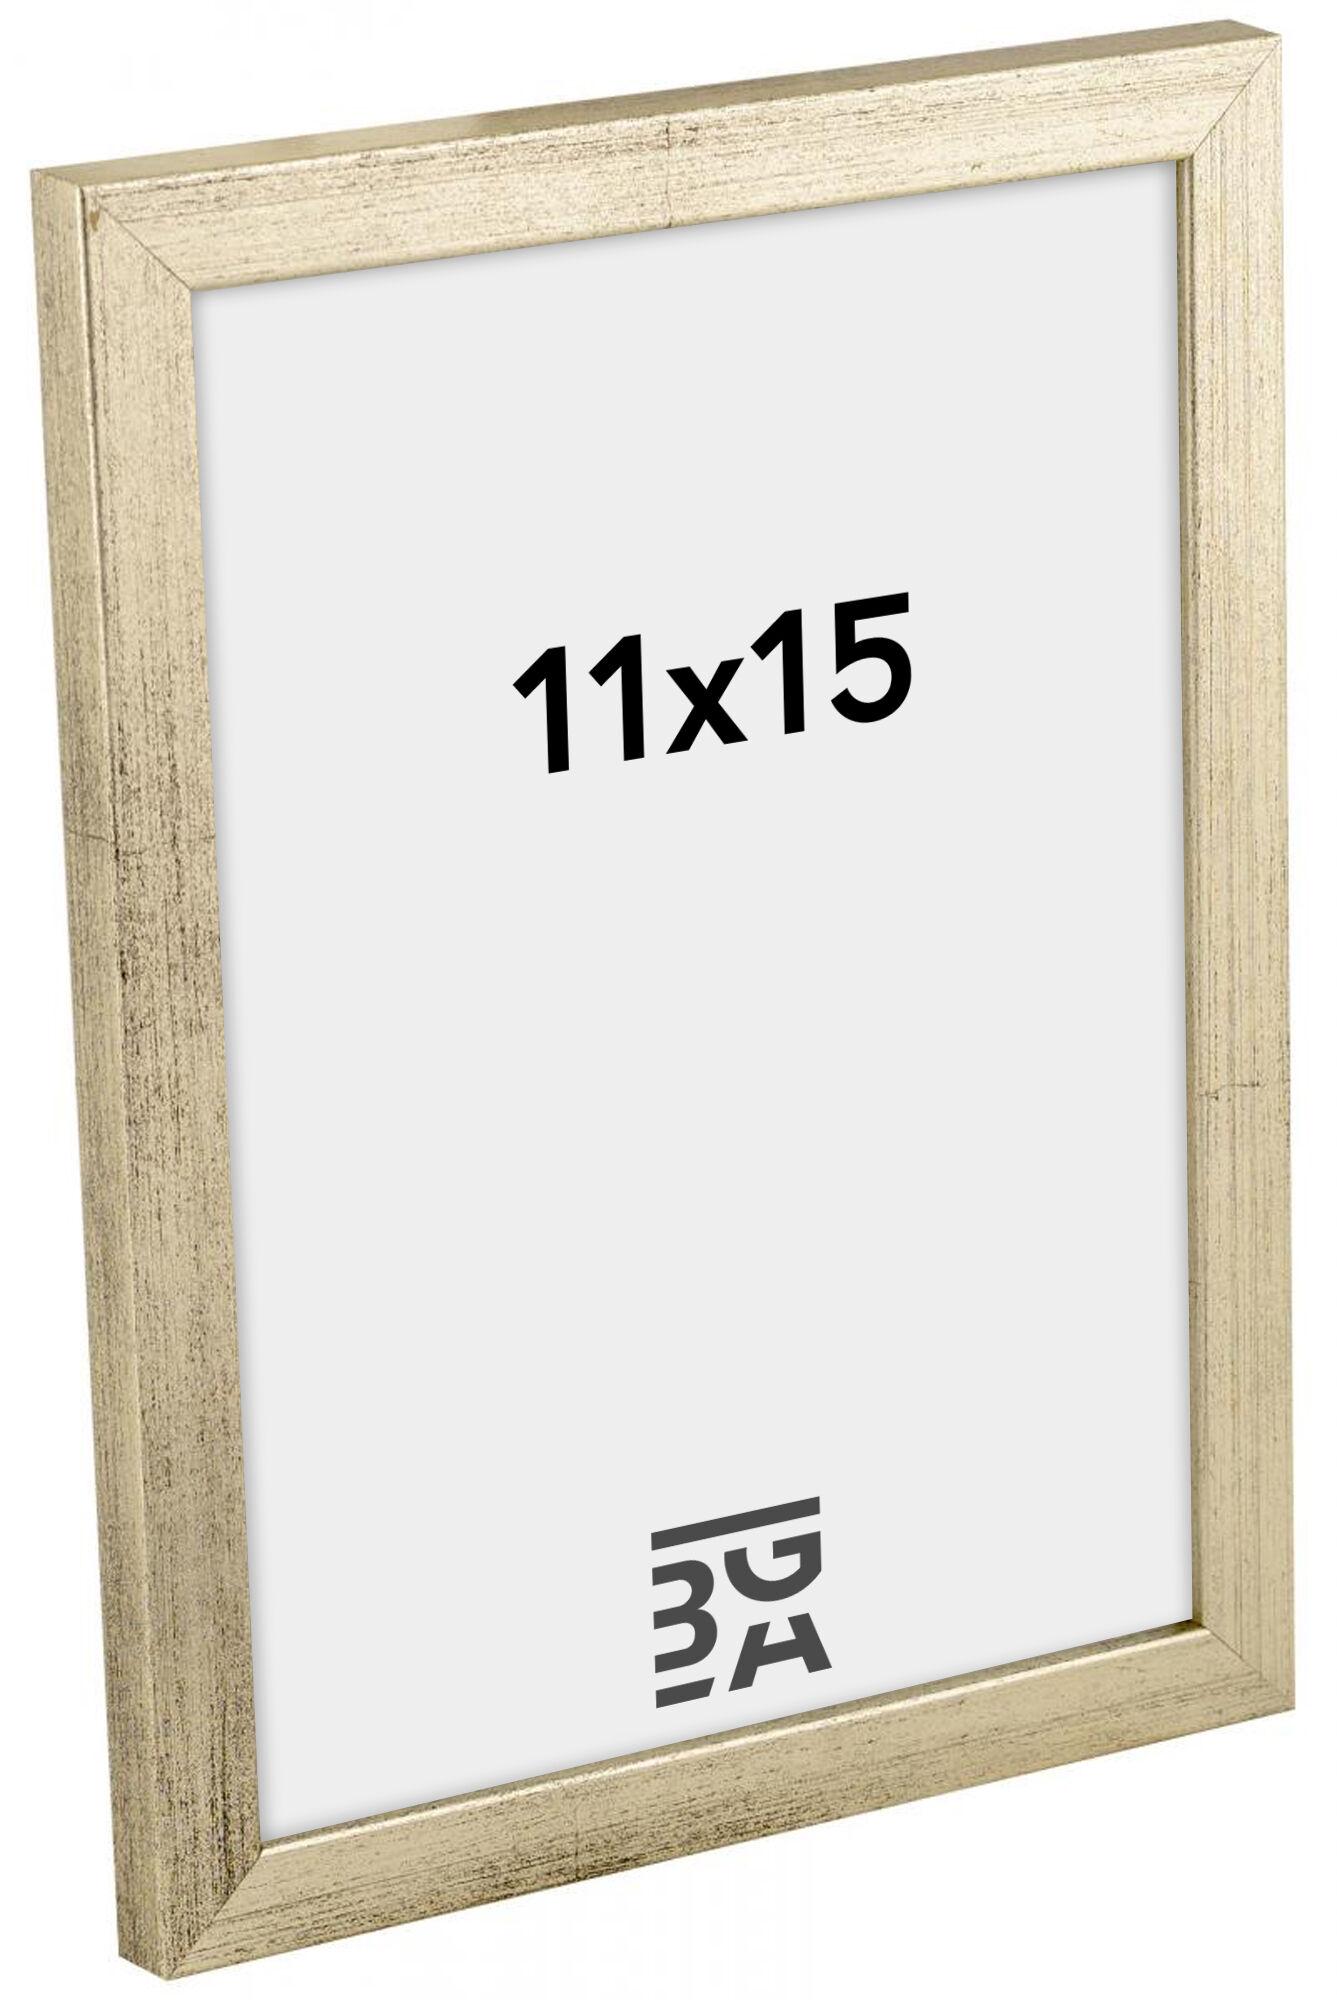 Estancia Galant Hopeanvärinen 11x15 cm